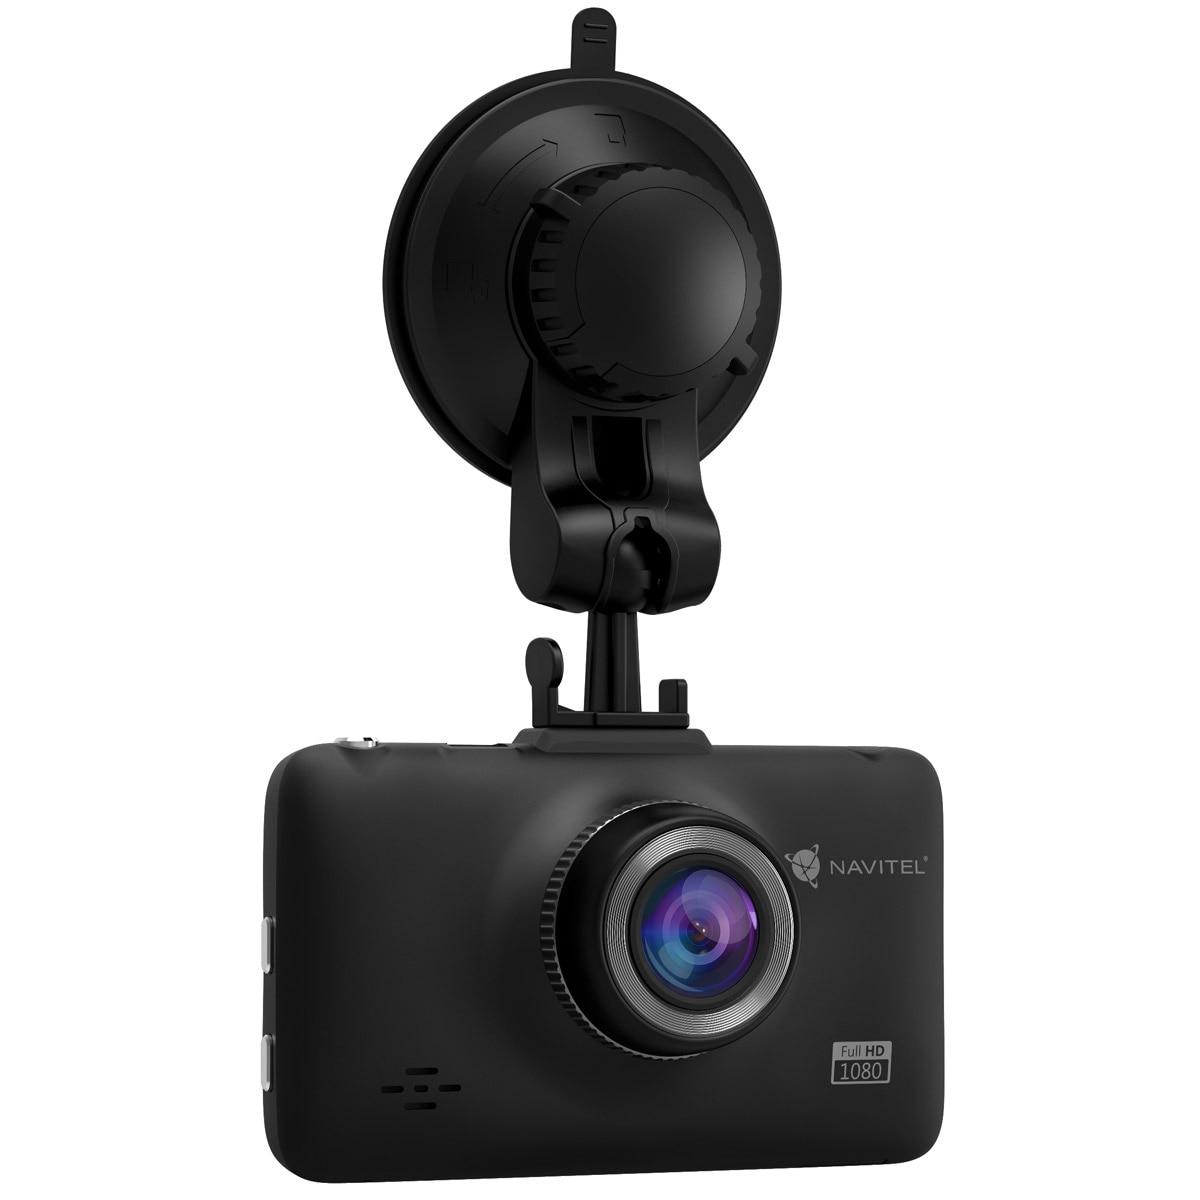 "Fotografie Camera Auto DVR Navitel CR900, ecran 2.7"" , Full HD, vizibilitate 120°, G-Sensor, Sony Exmor R CMOS"